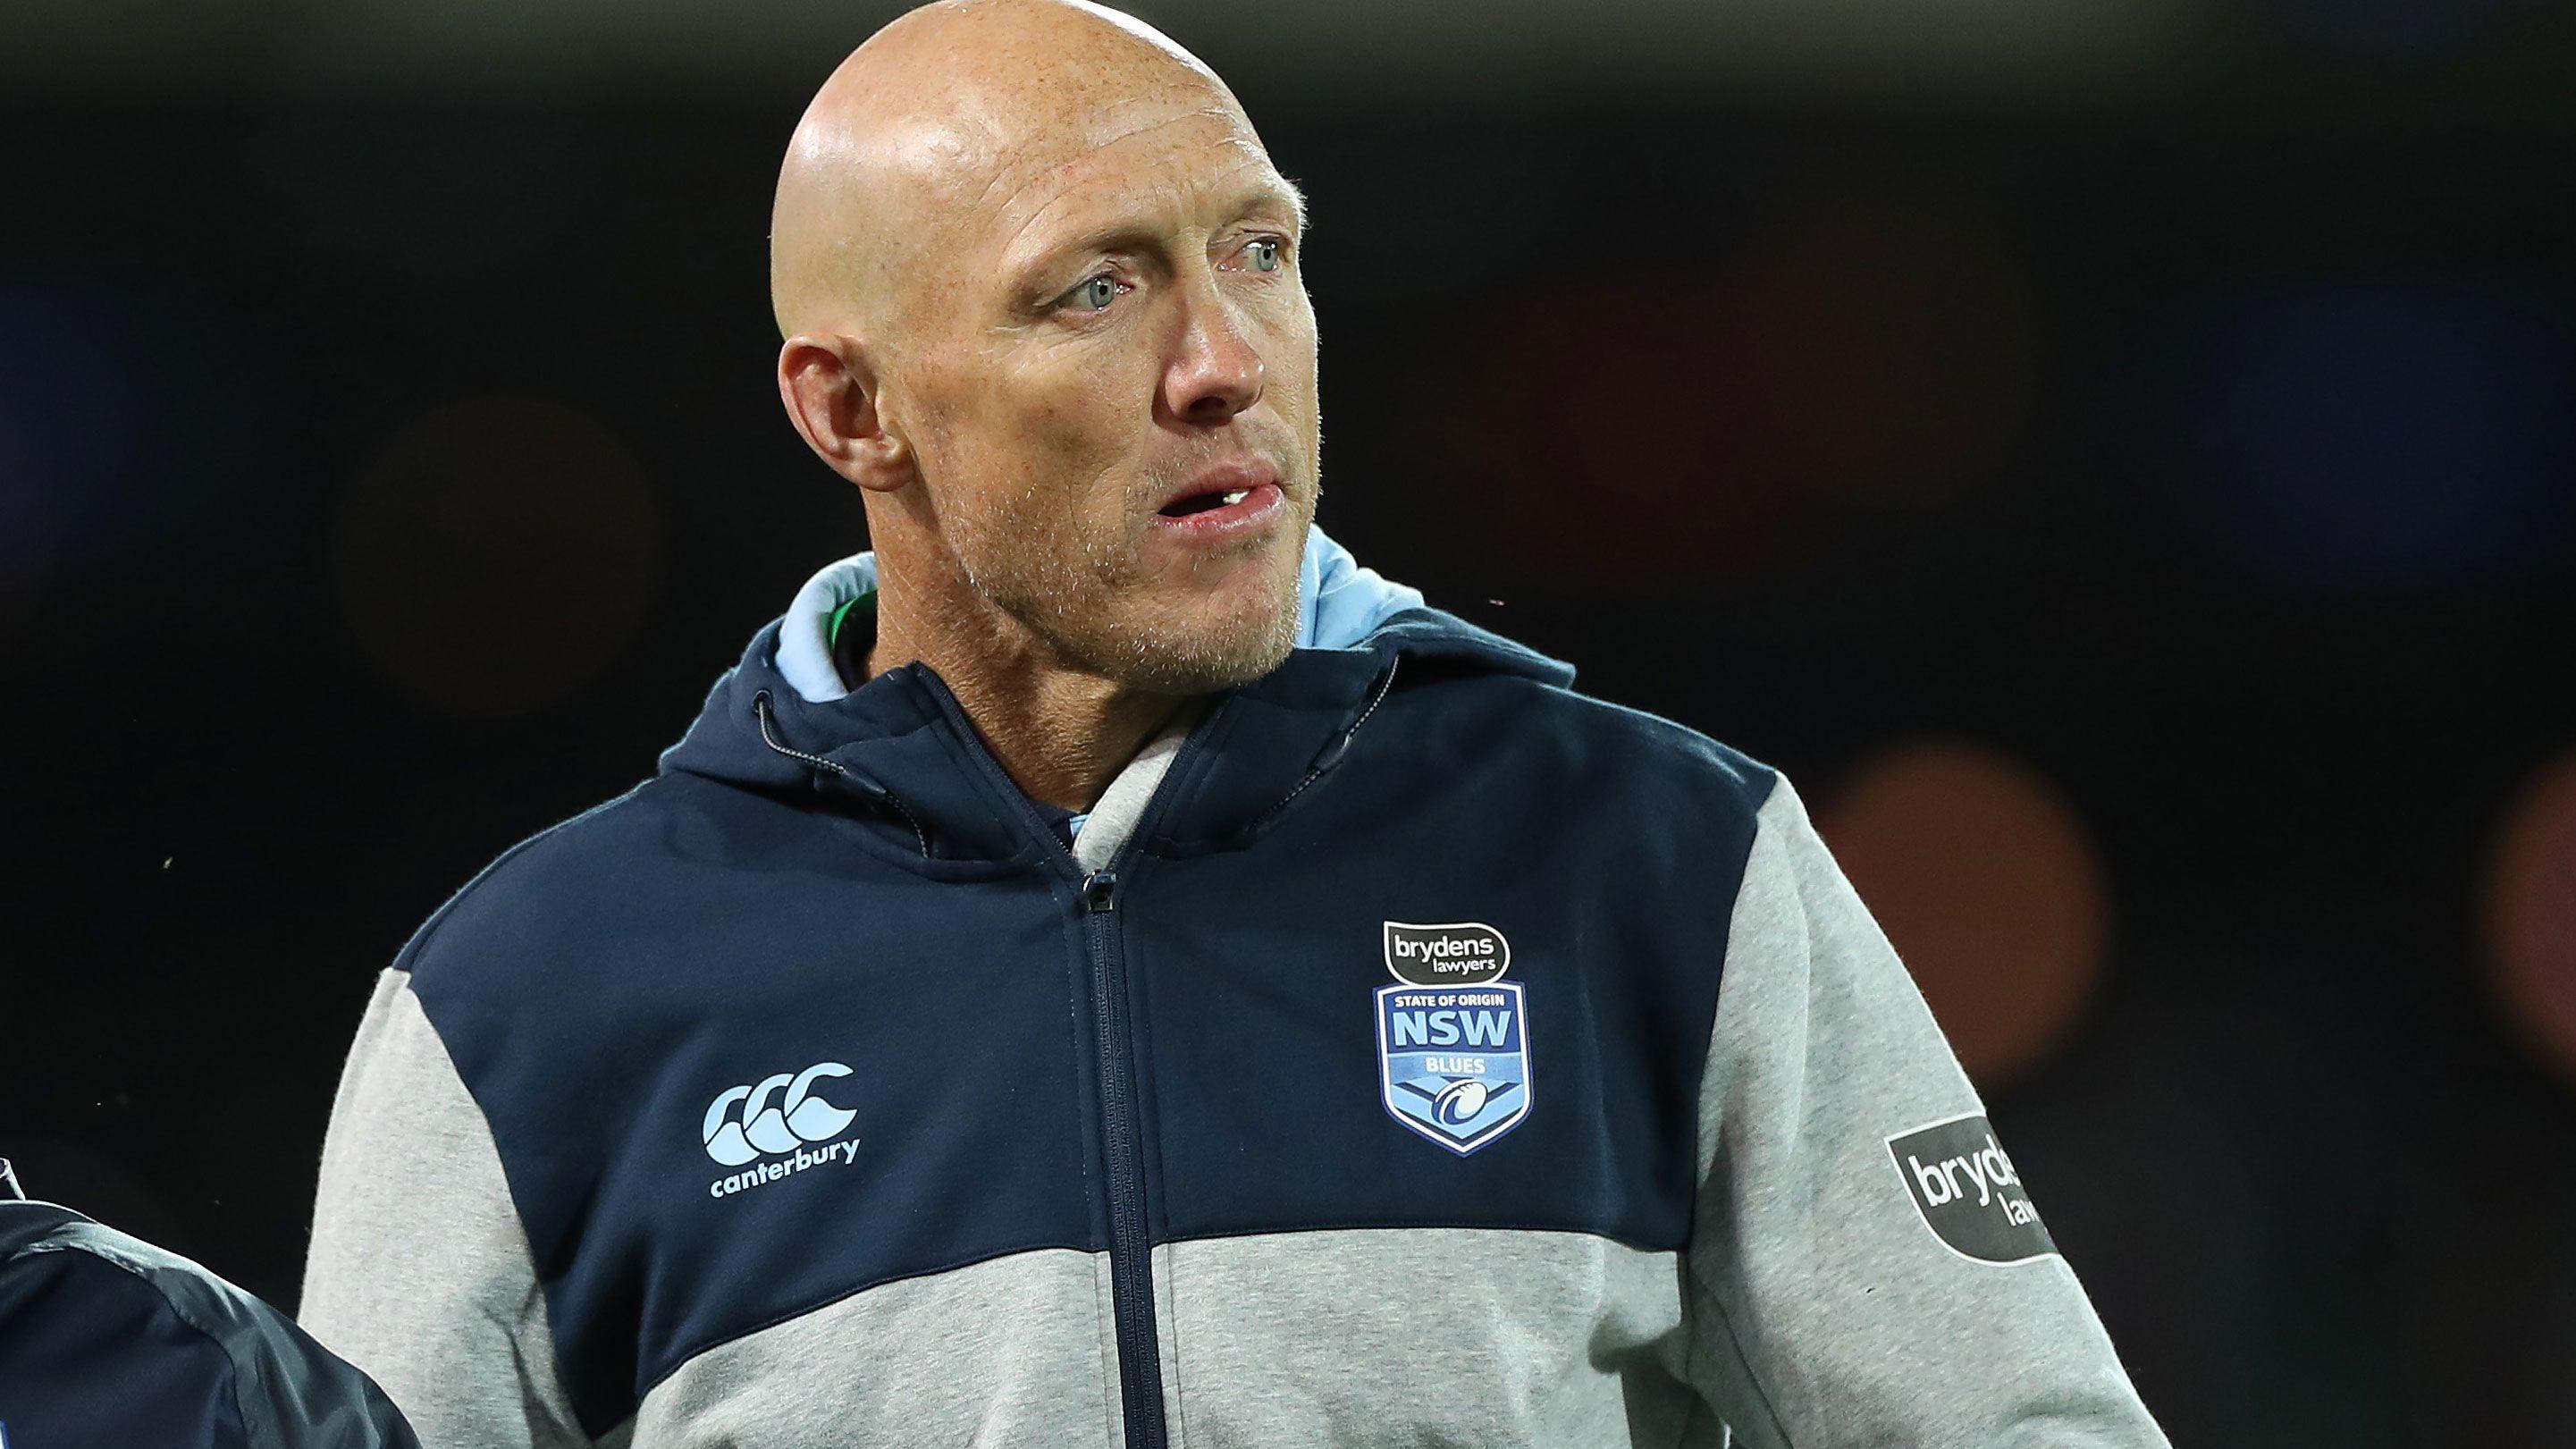 EXCLUSIVE: Andrew Johns sees possible job for John Morris at Sharks under Craig Fitzgibbon